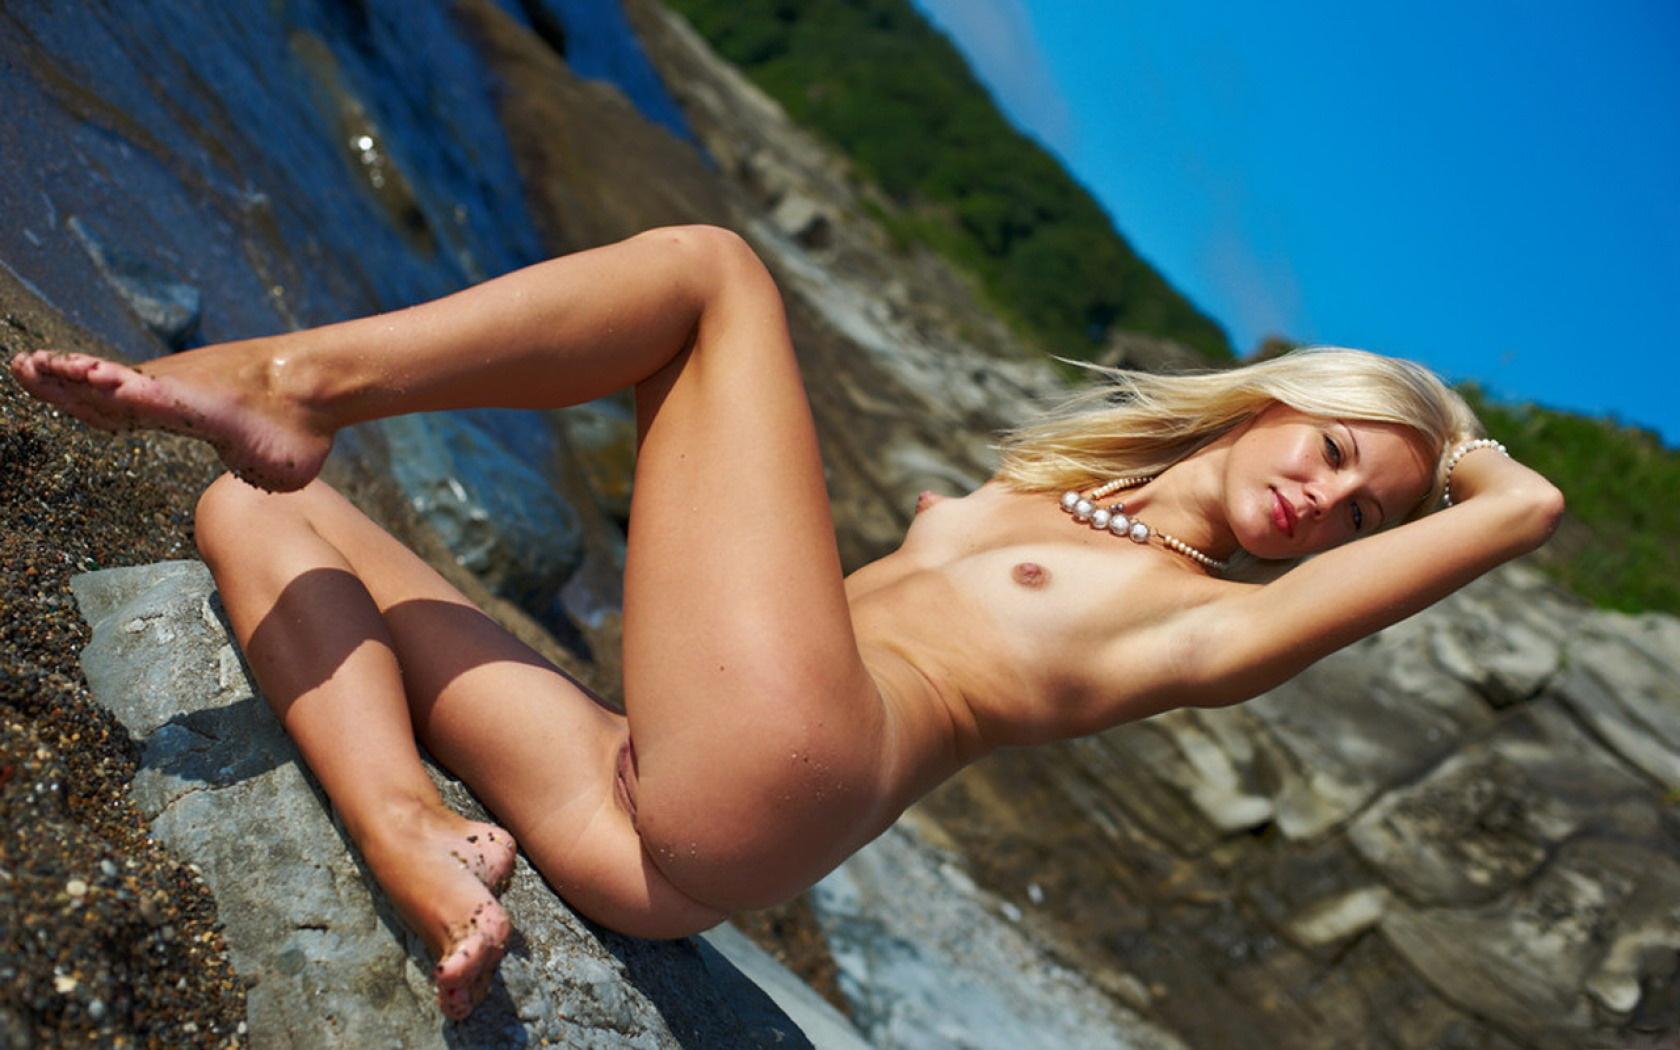 sexy naked pregnet girl feet